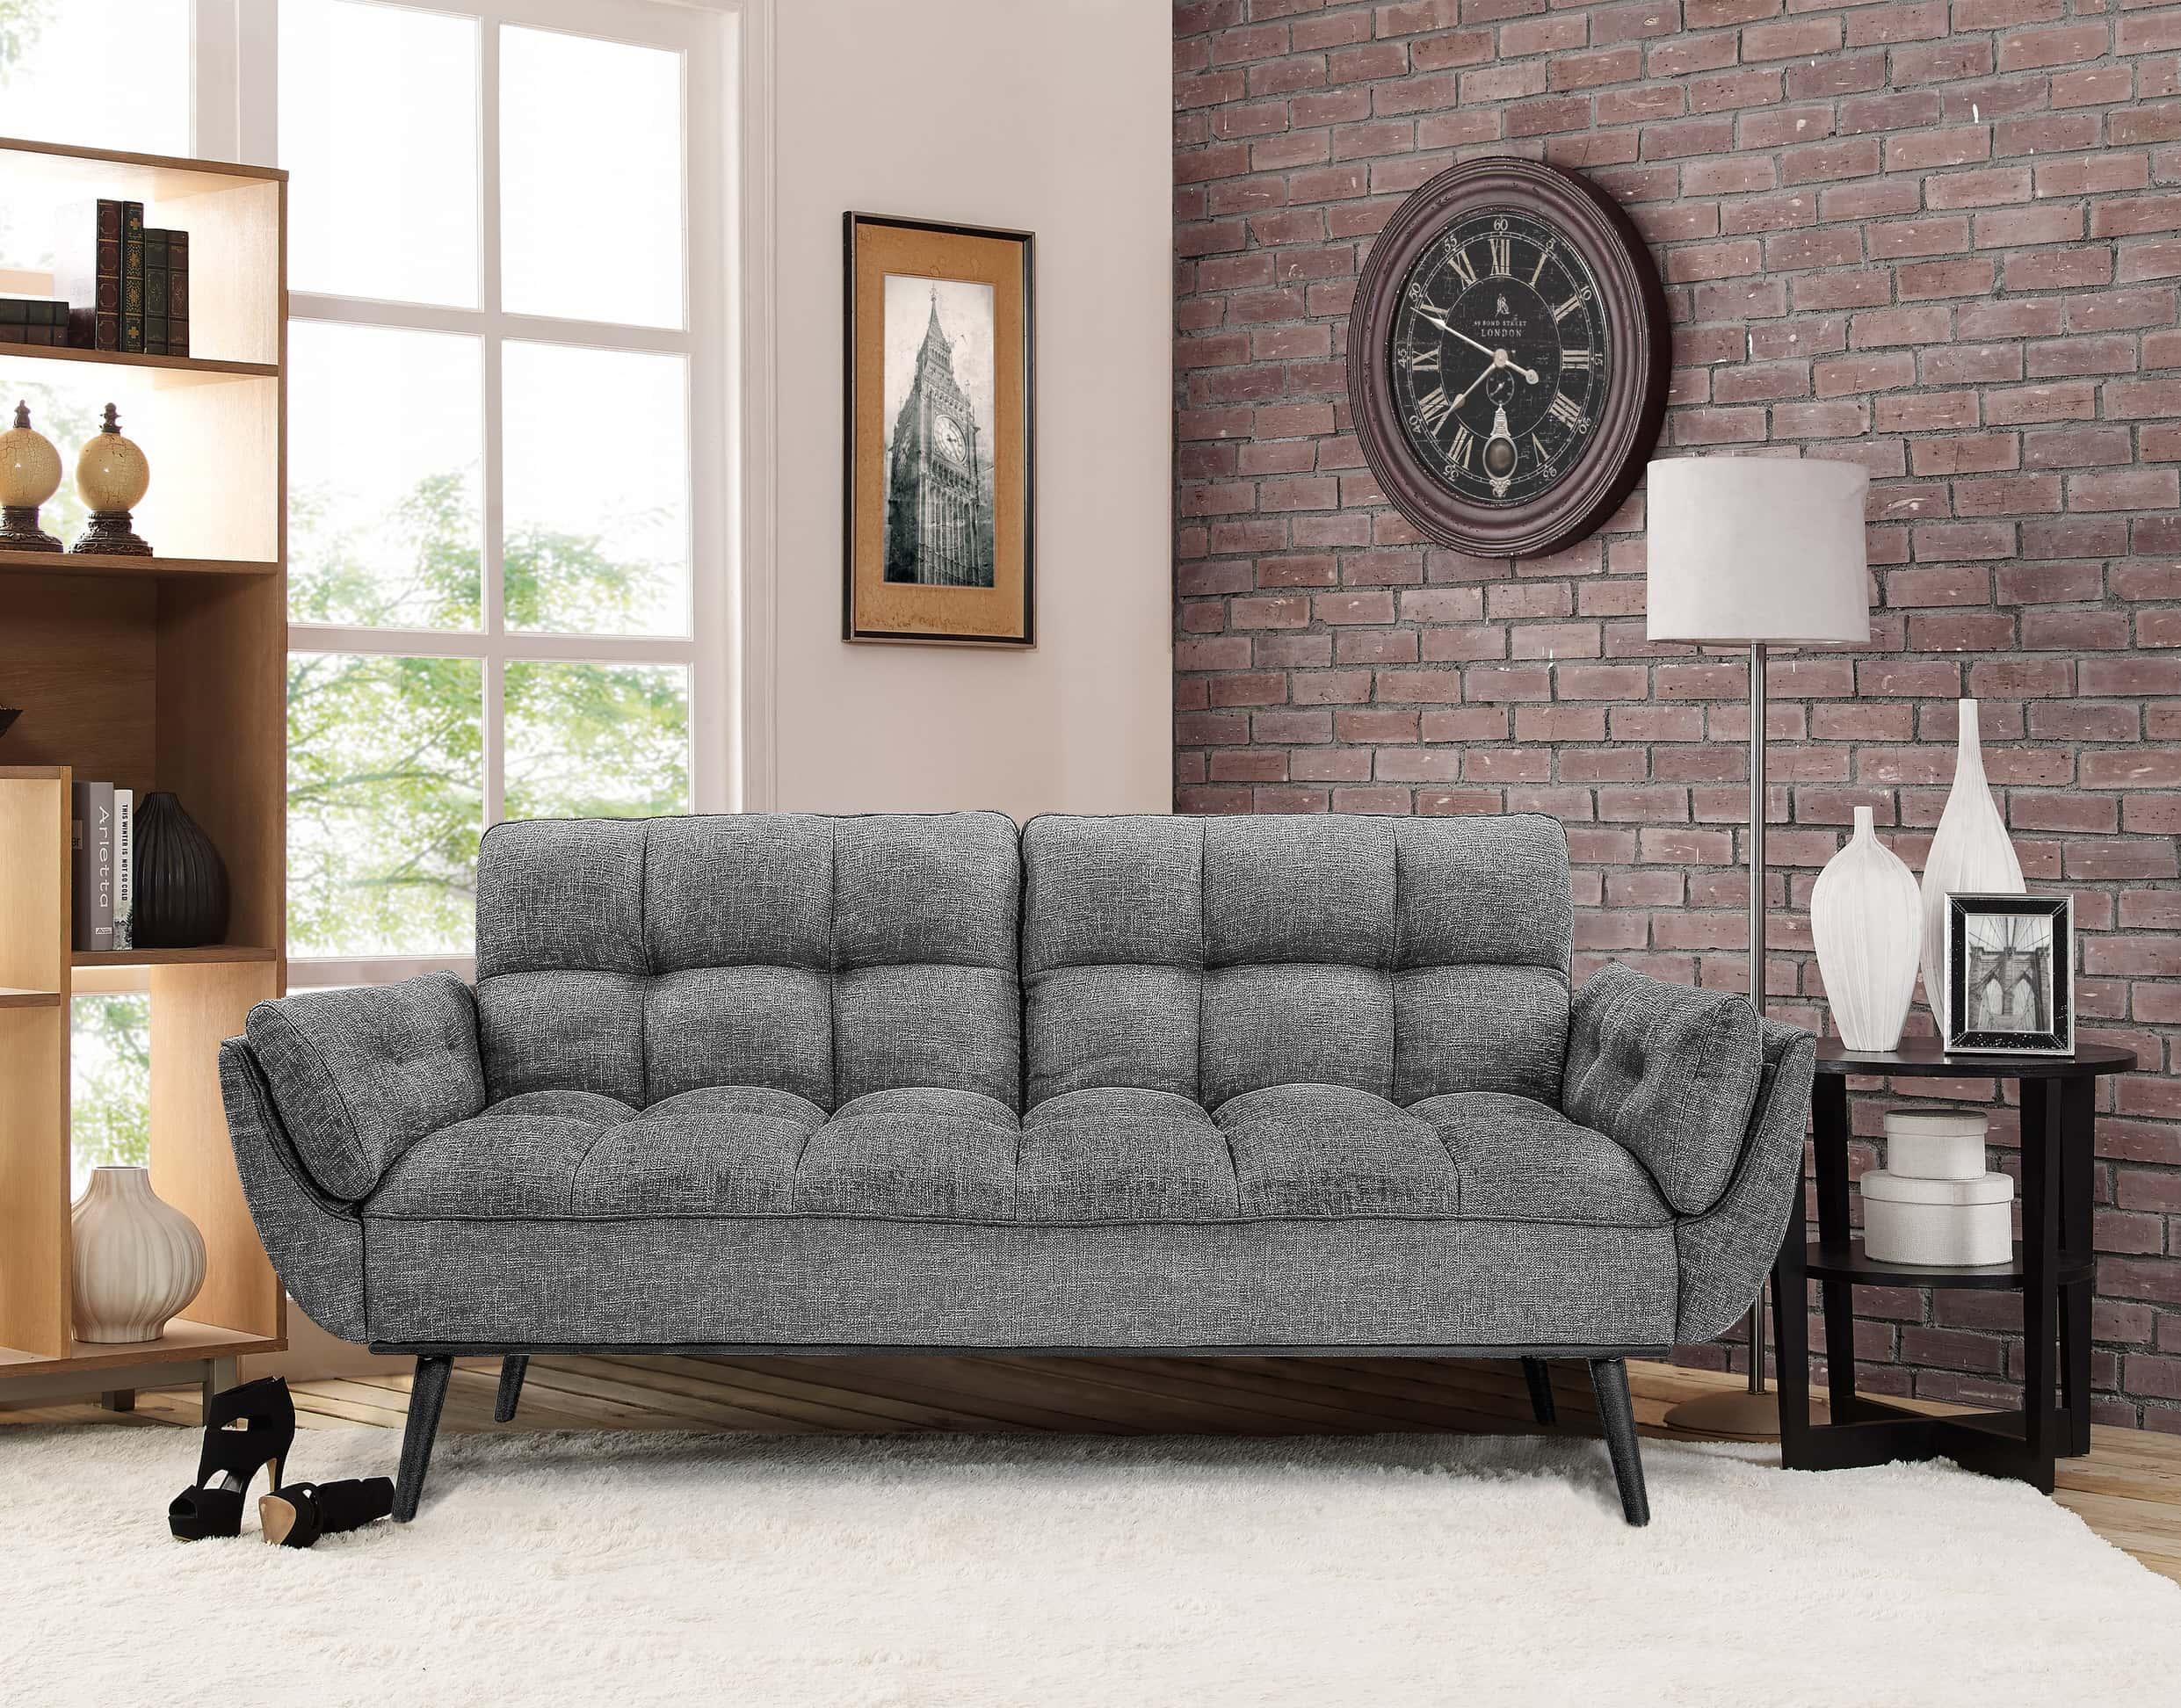 Serta Living Room Furniture Candice Convertible Sofa Dark Gray By Serta Lifestyle